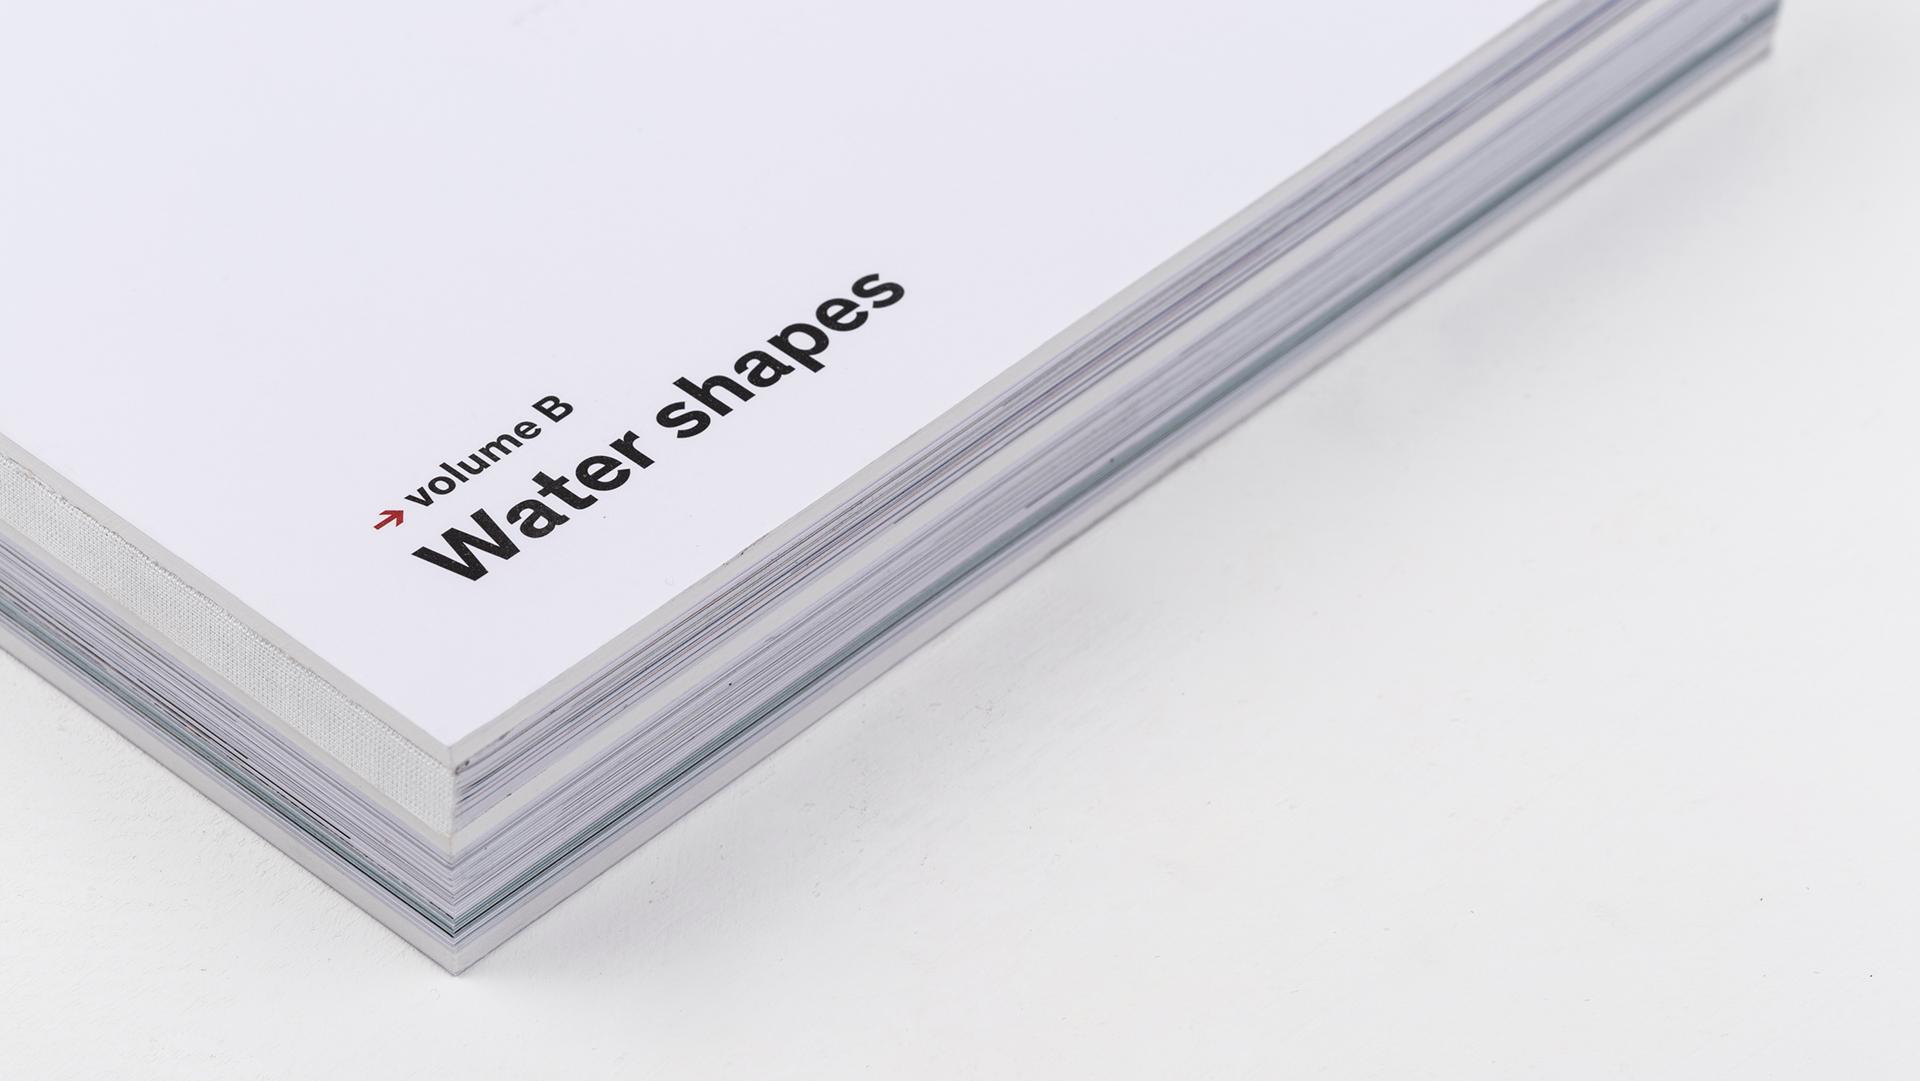 watercube book detail